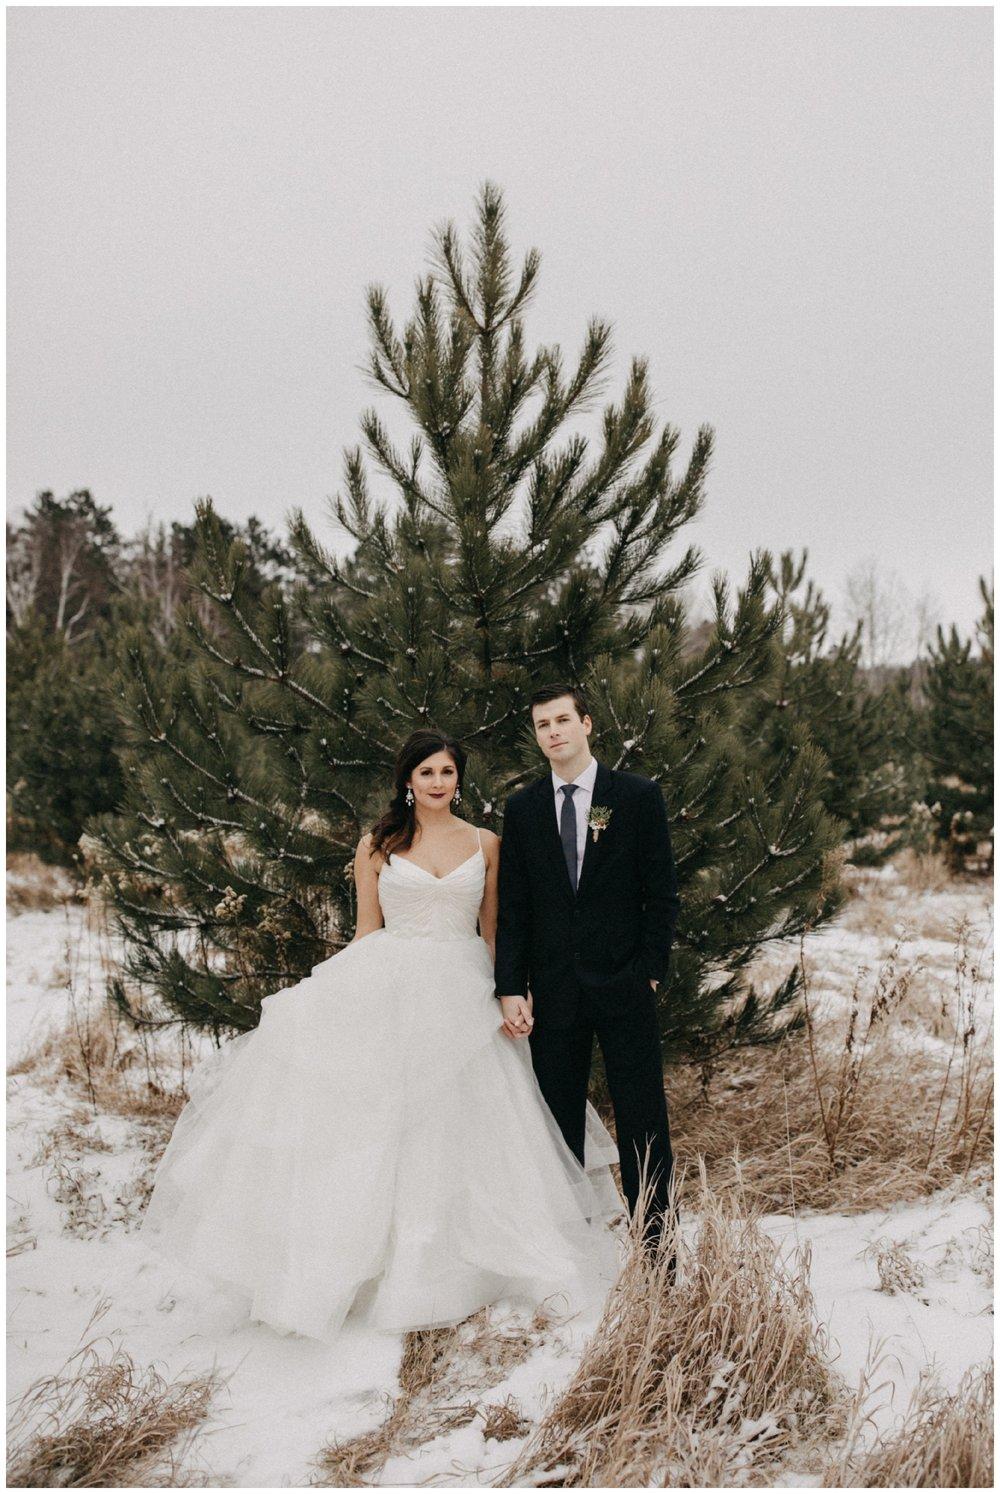 Pine Peaks Crosslake Minnesota winter wedding